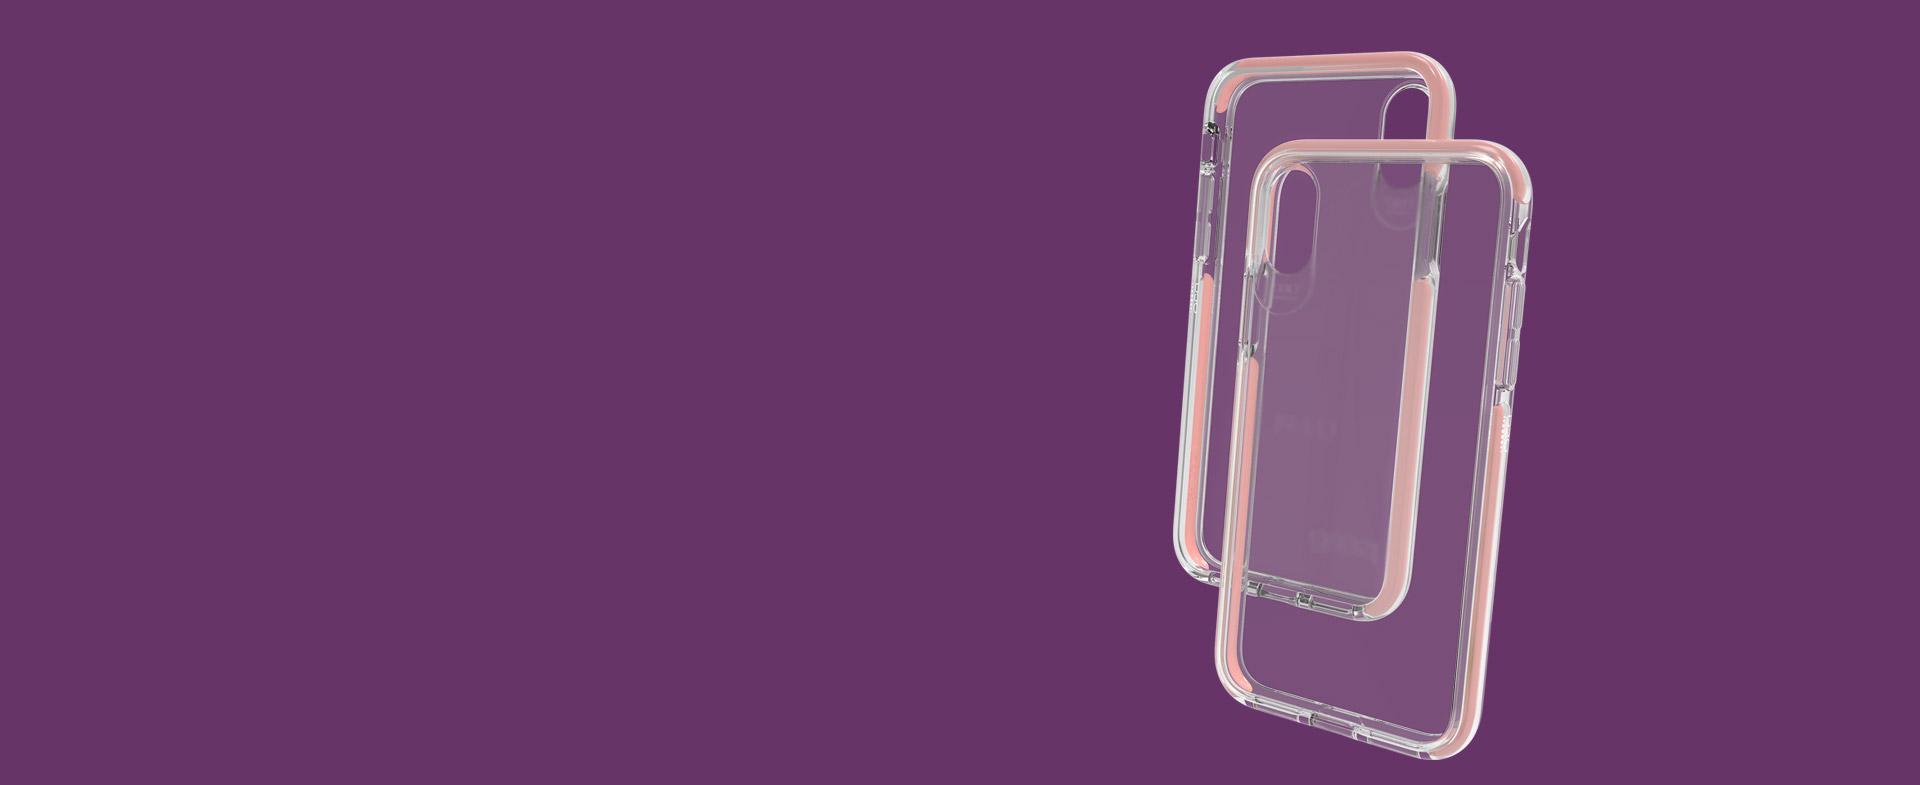 accessoire-telephone-iphone-slider